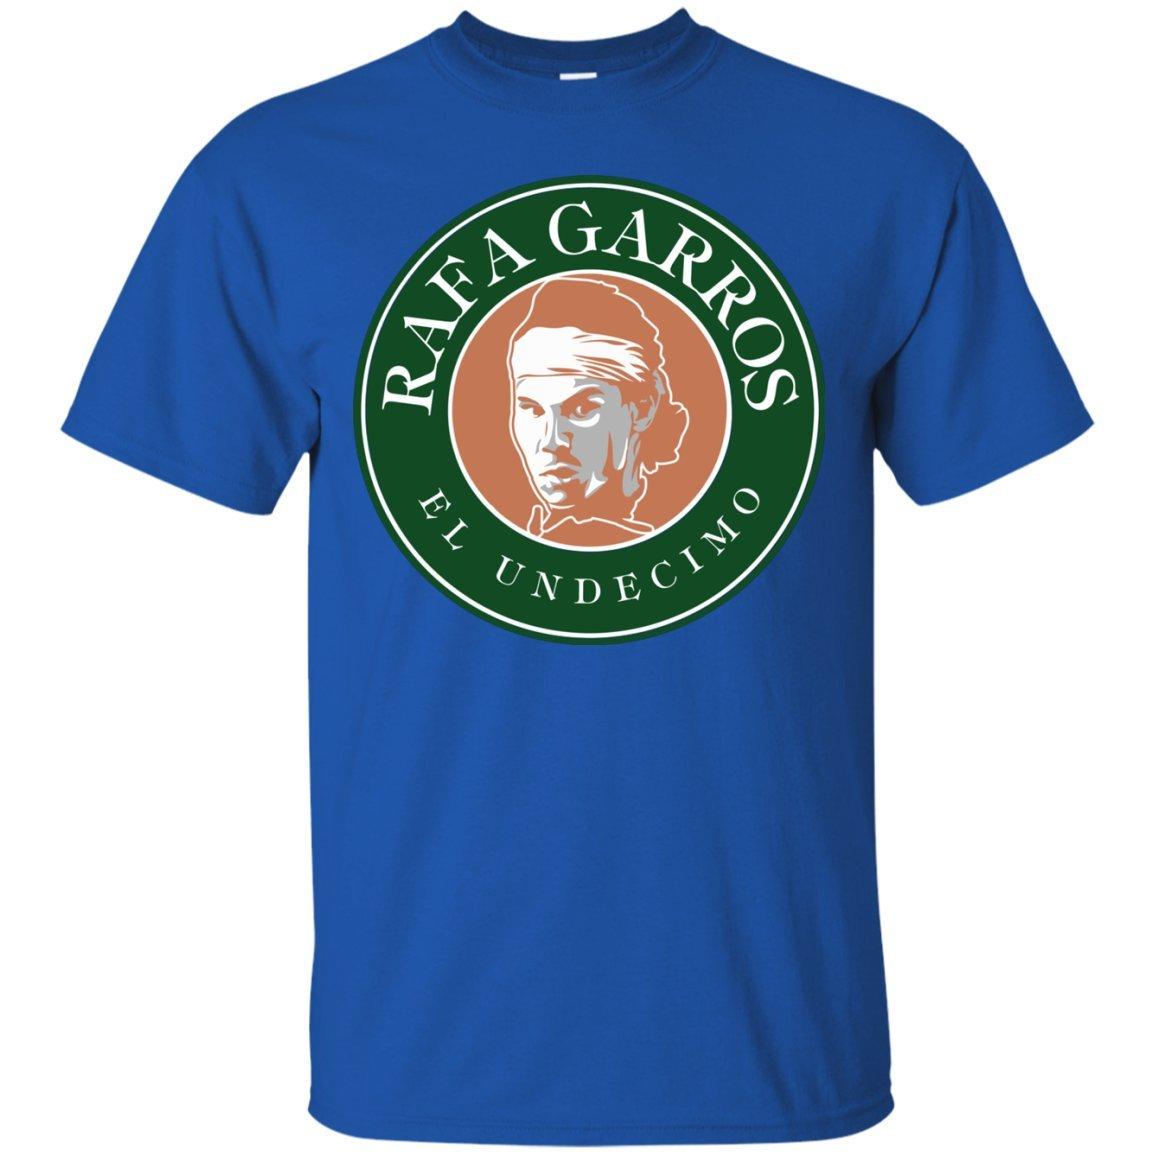 eb6ace18e2 Amazon.com: Rafa Garros Tennis T-Shirt - Rafael Nadal King of Clay ...